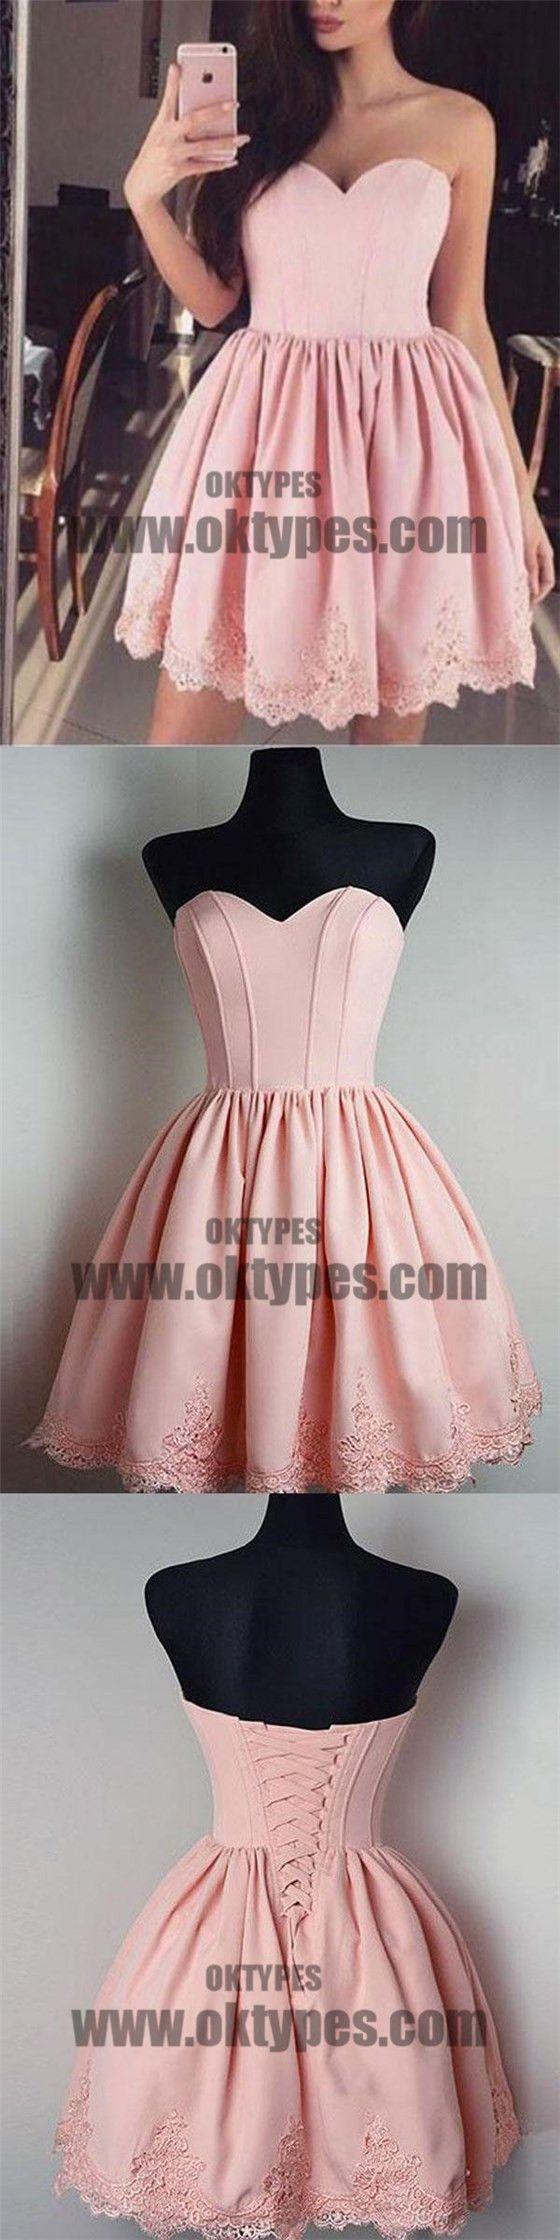 Cheap short simple cute sweetheart pink homecoming dresses